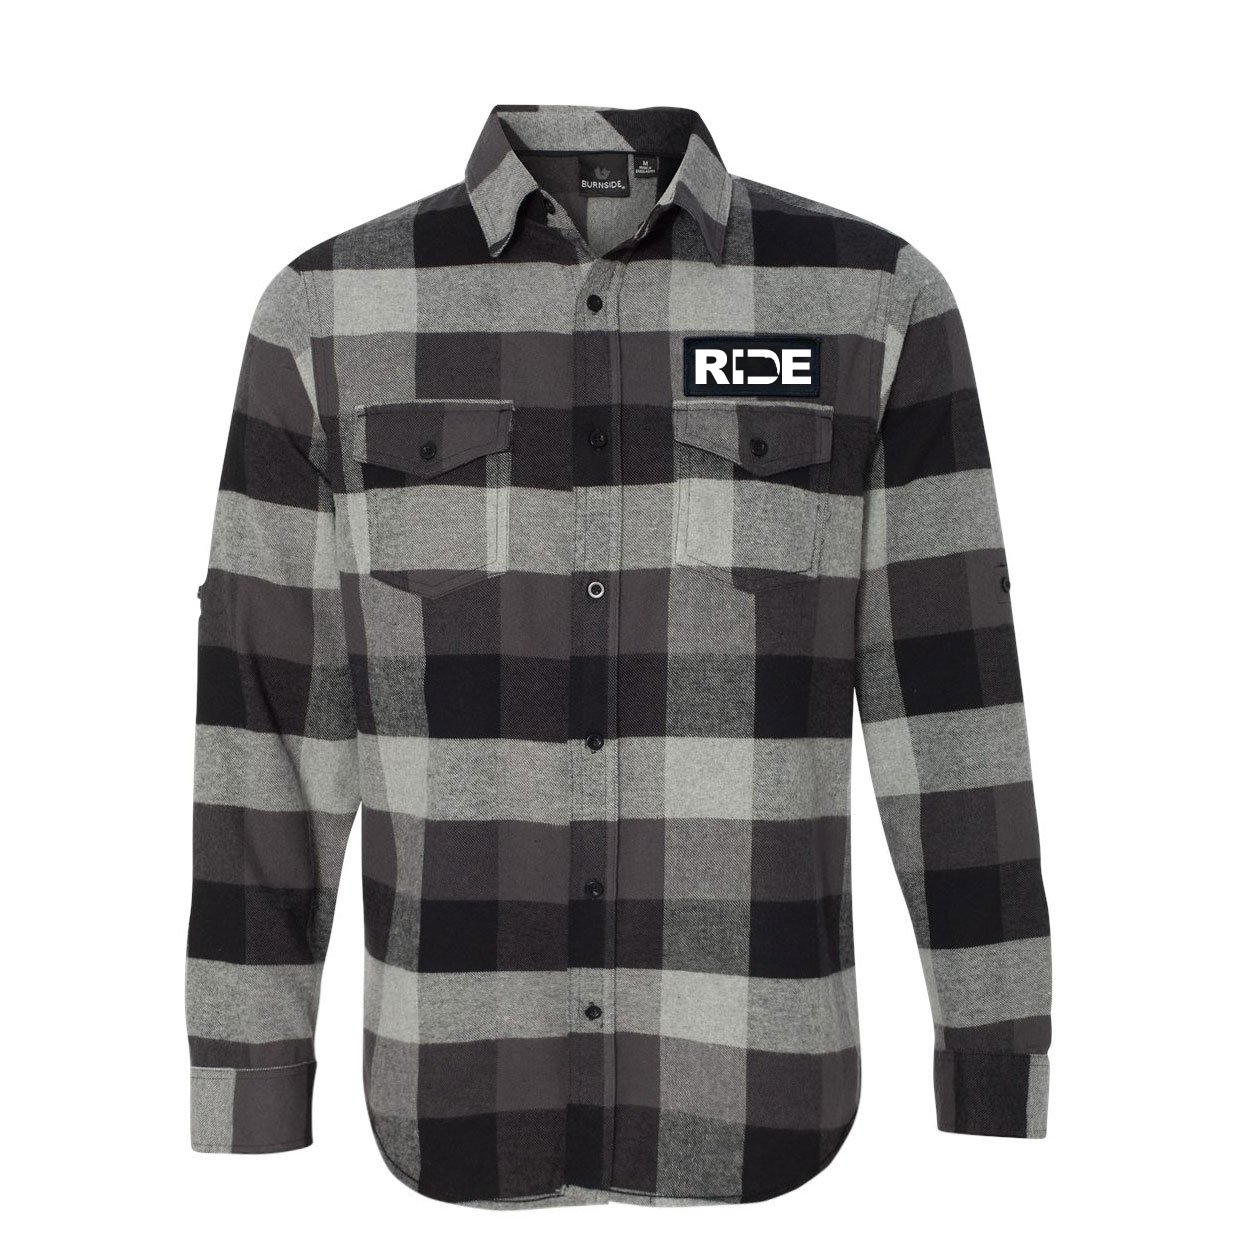 Ride Nebraska Classic Unisex Long Sleeve Woven Patch Flannel Shirt Black/Gray (White Logo)